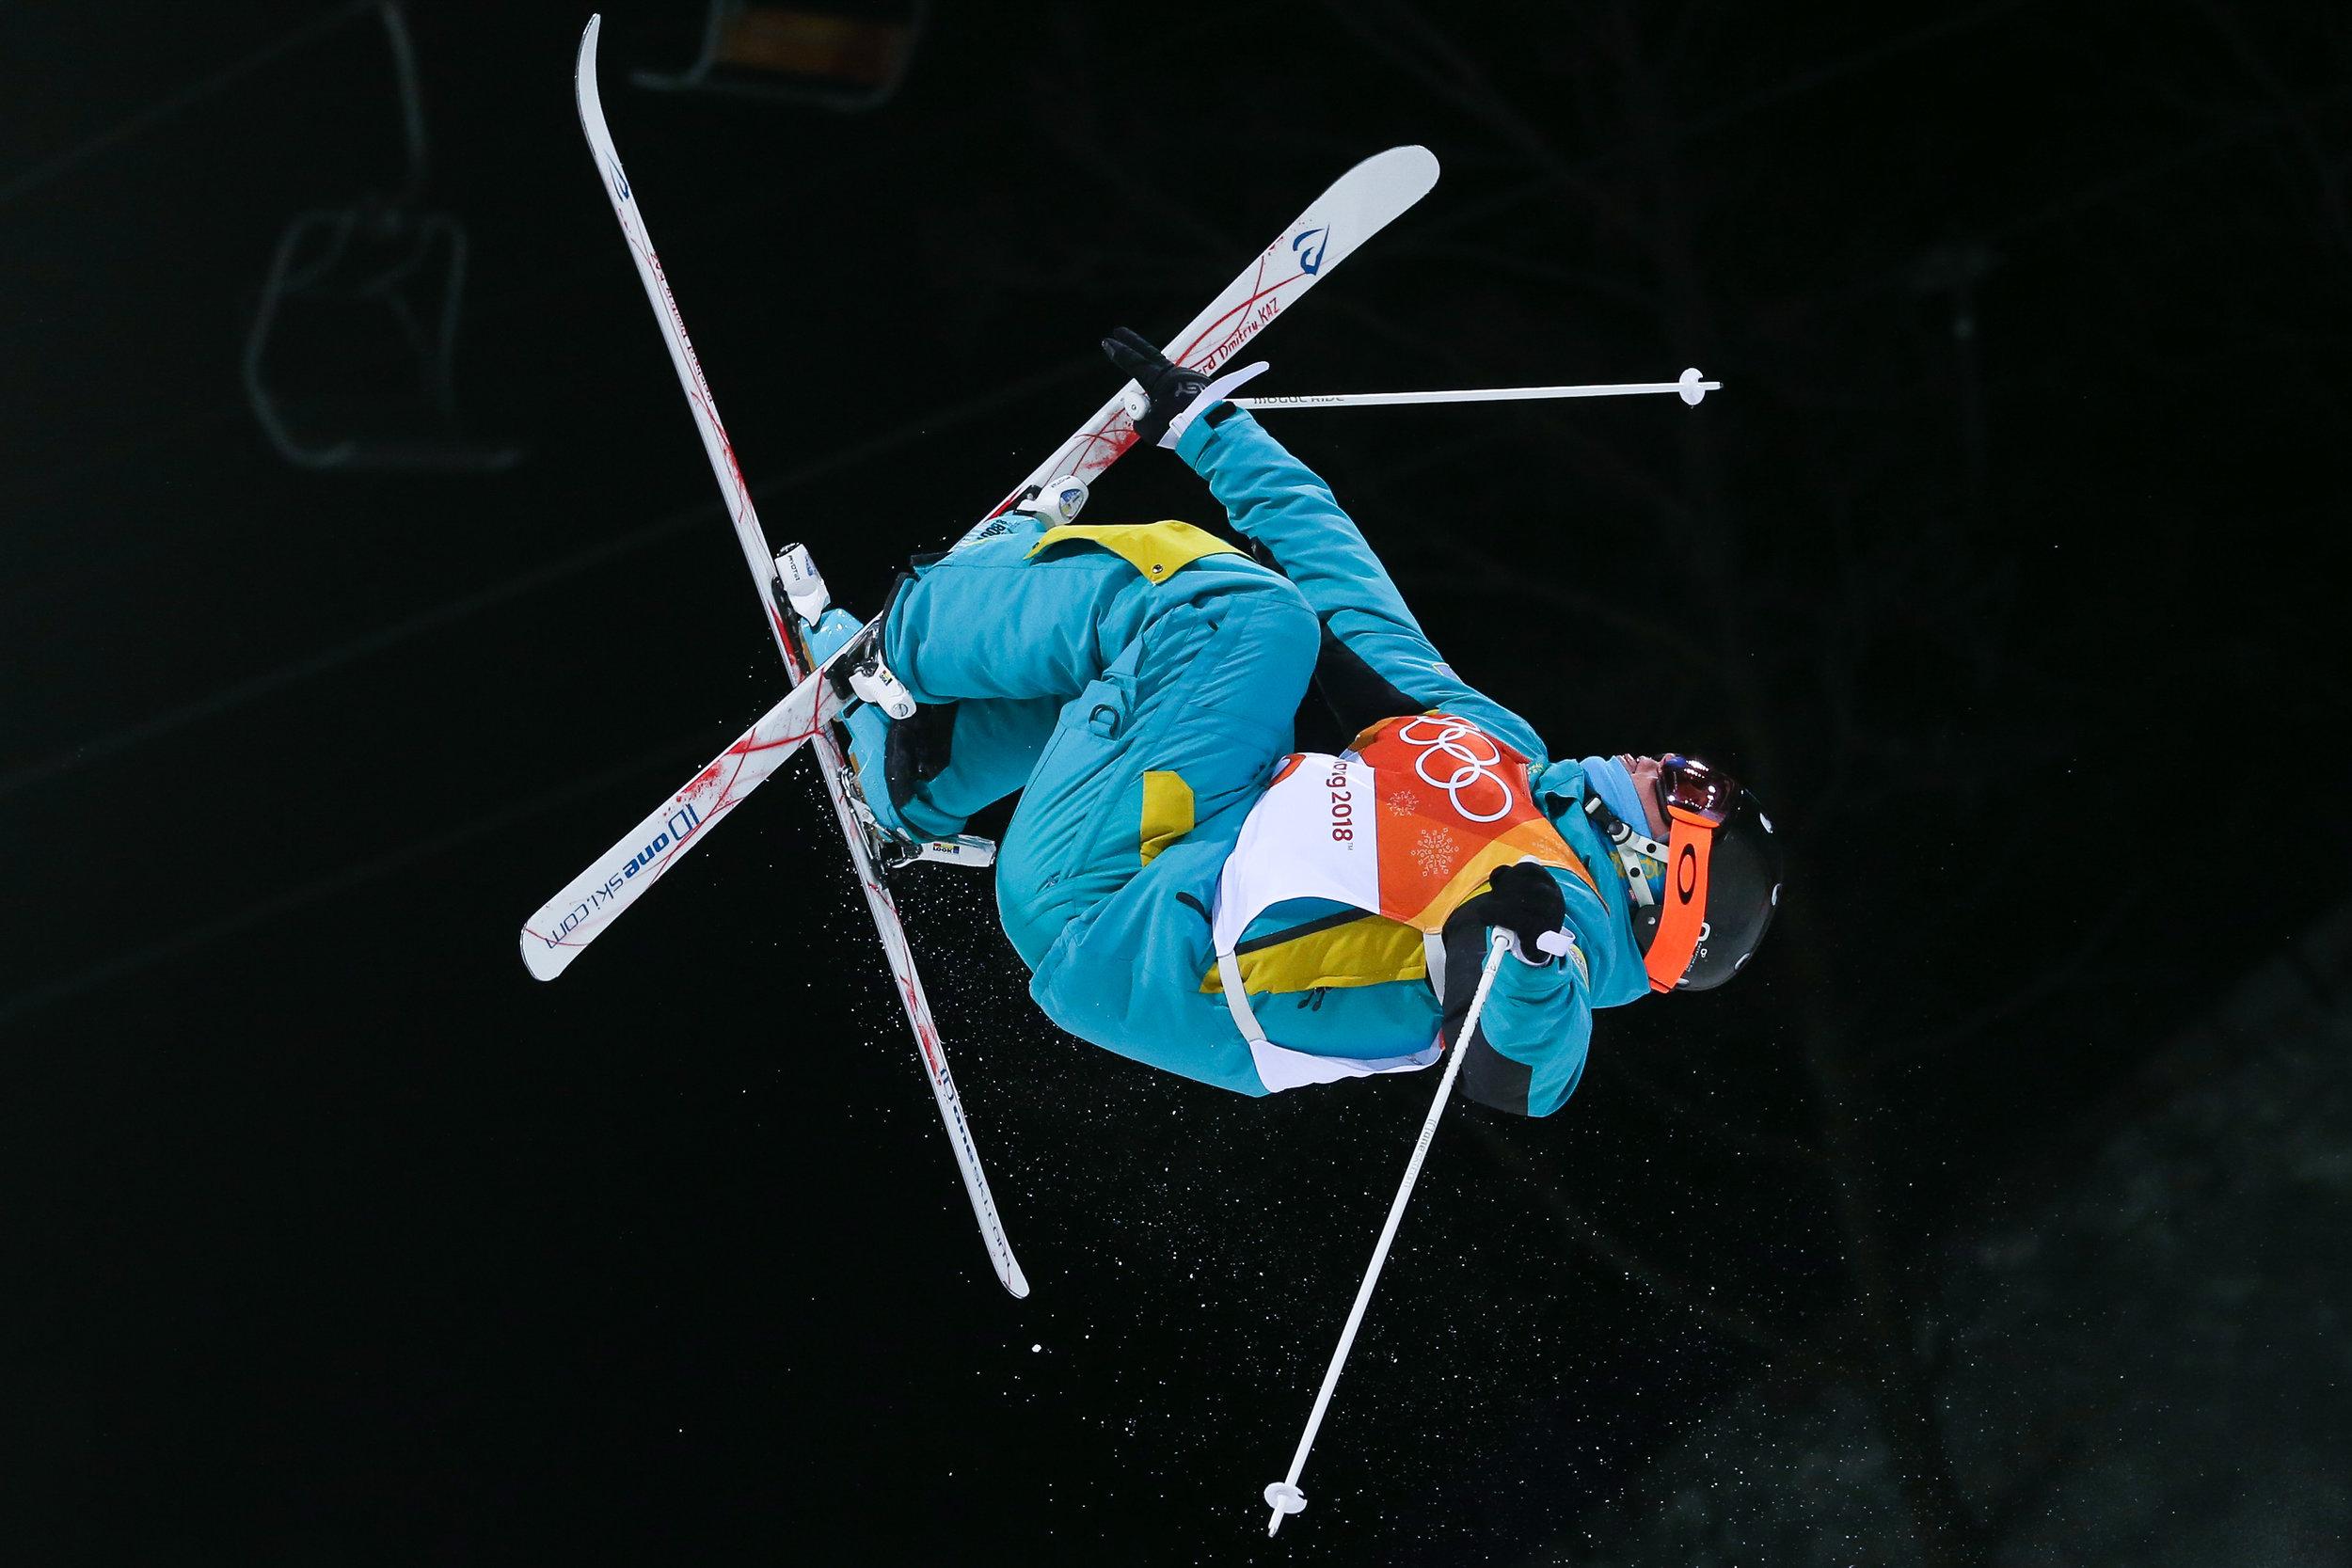 Kazakstan's Dmitriy Reikherd hits the last jump in the Men's Moguls finals on day three of the 2018 Pyeongchang Winter Olympics at Phoenix Snow Park in Pyeongchang, South Korea, on February 12, 2018. Photo by Matthew Healey/UPI